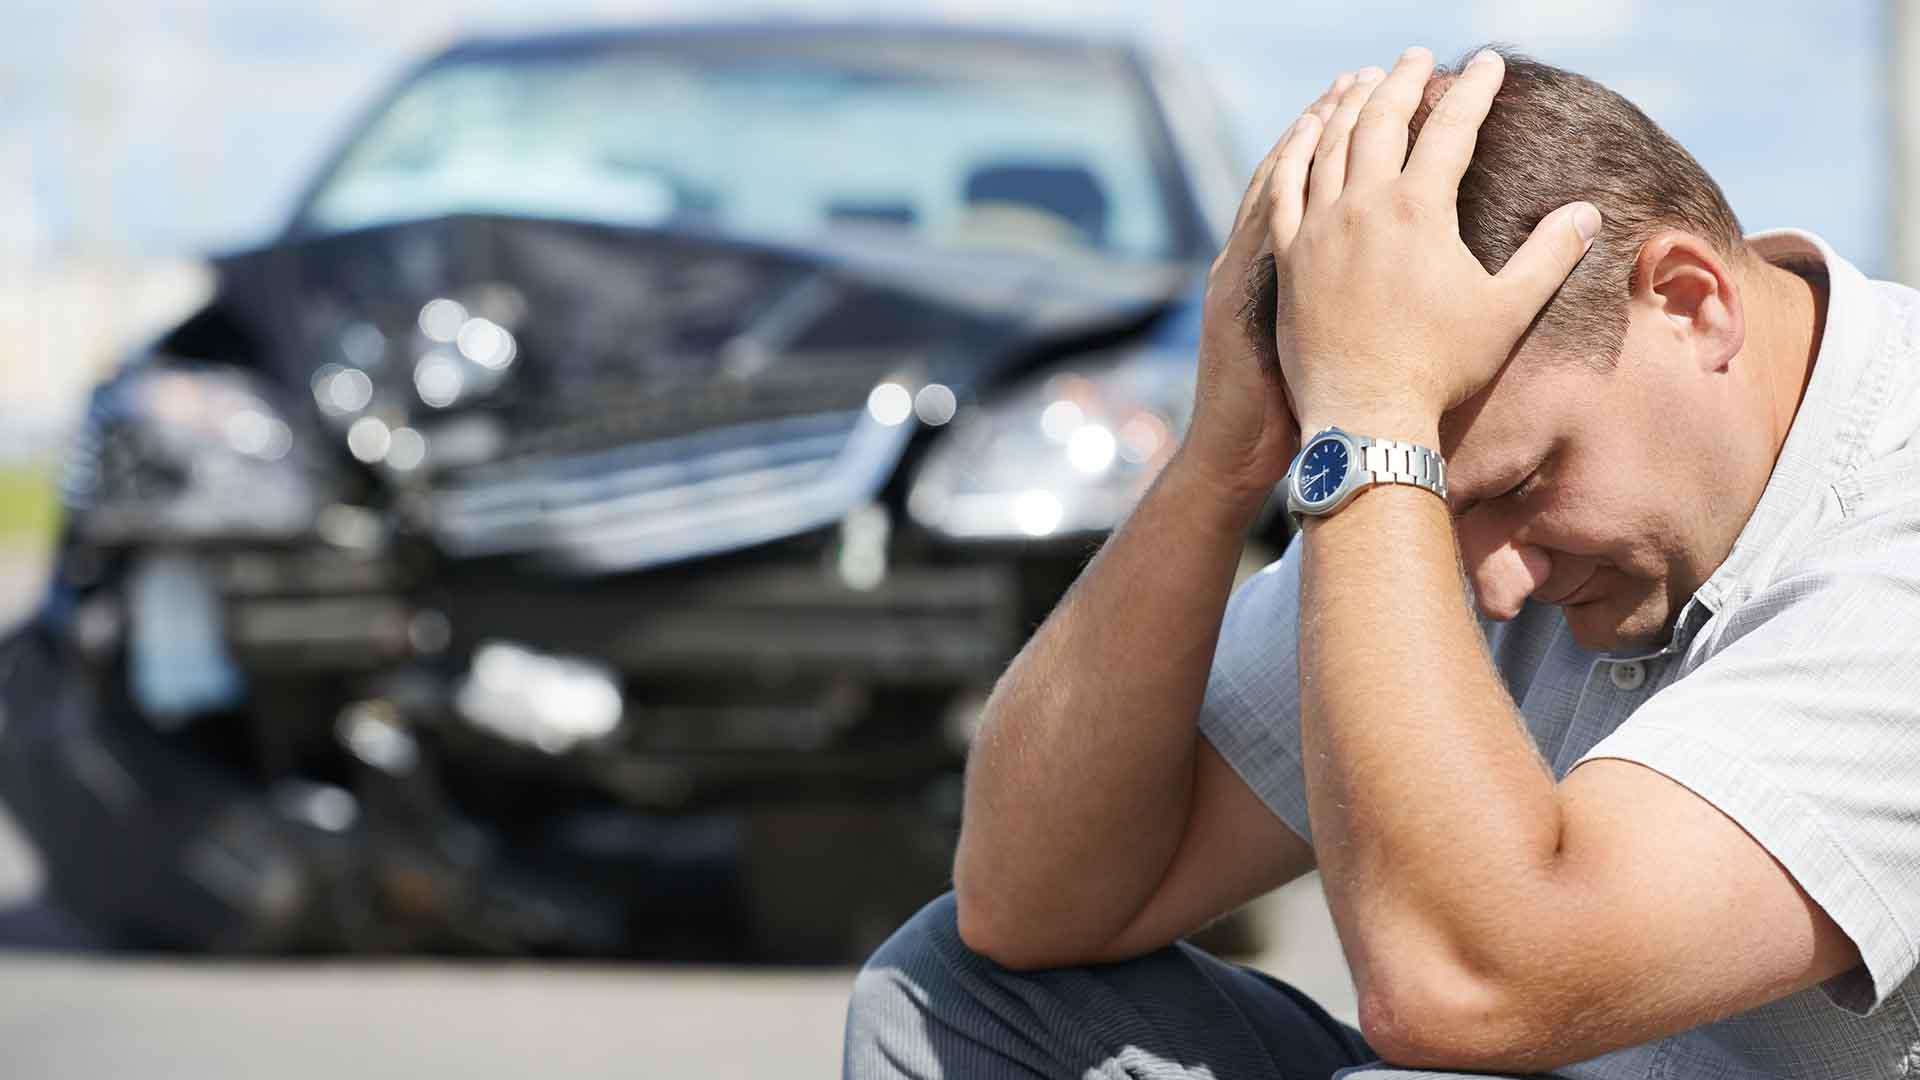 Men pay more for car insurance than women